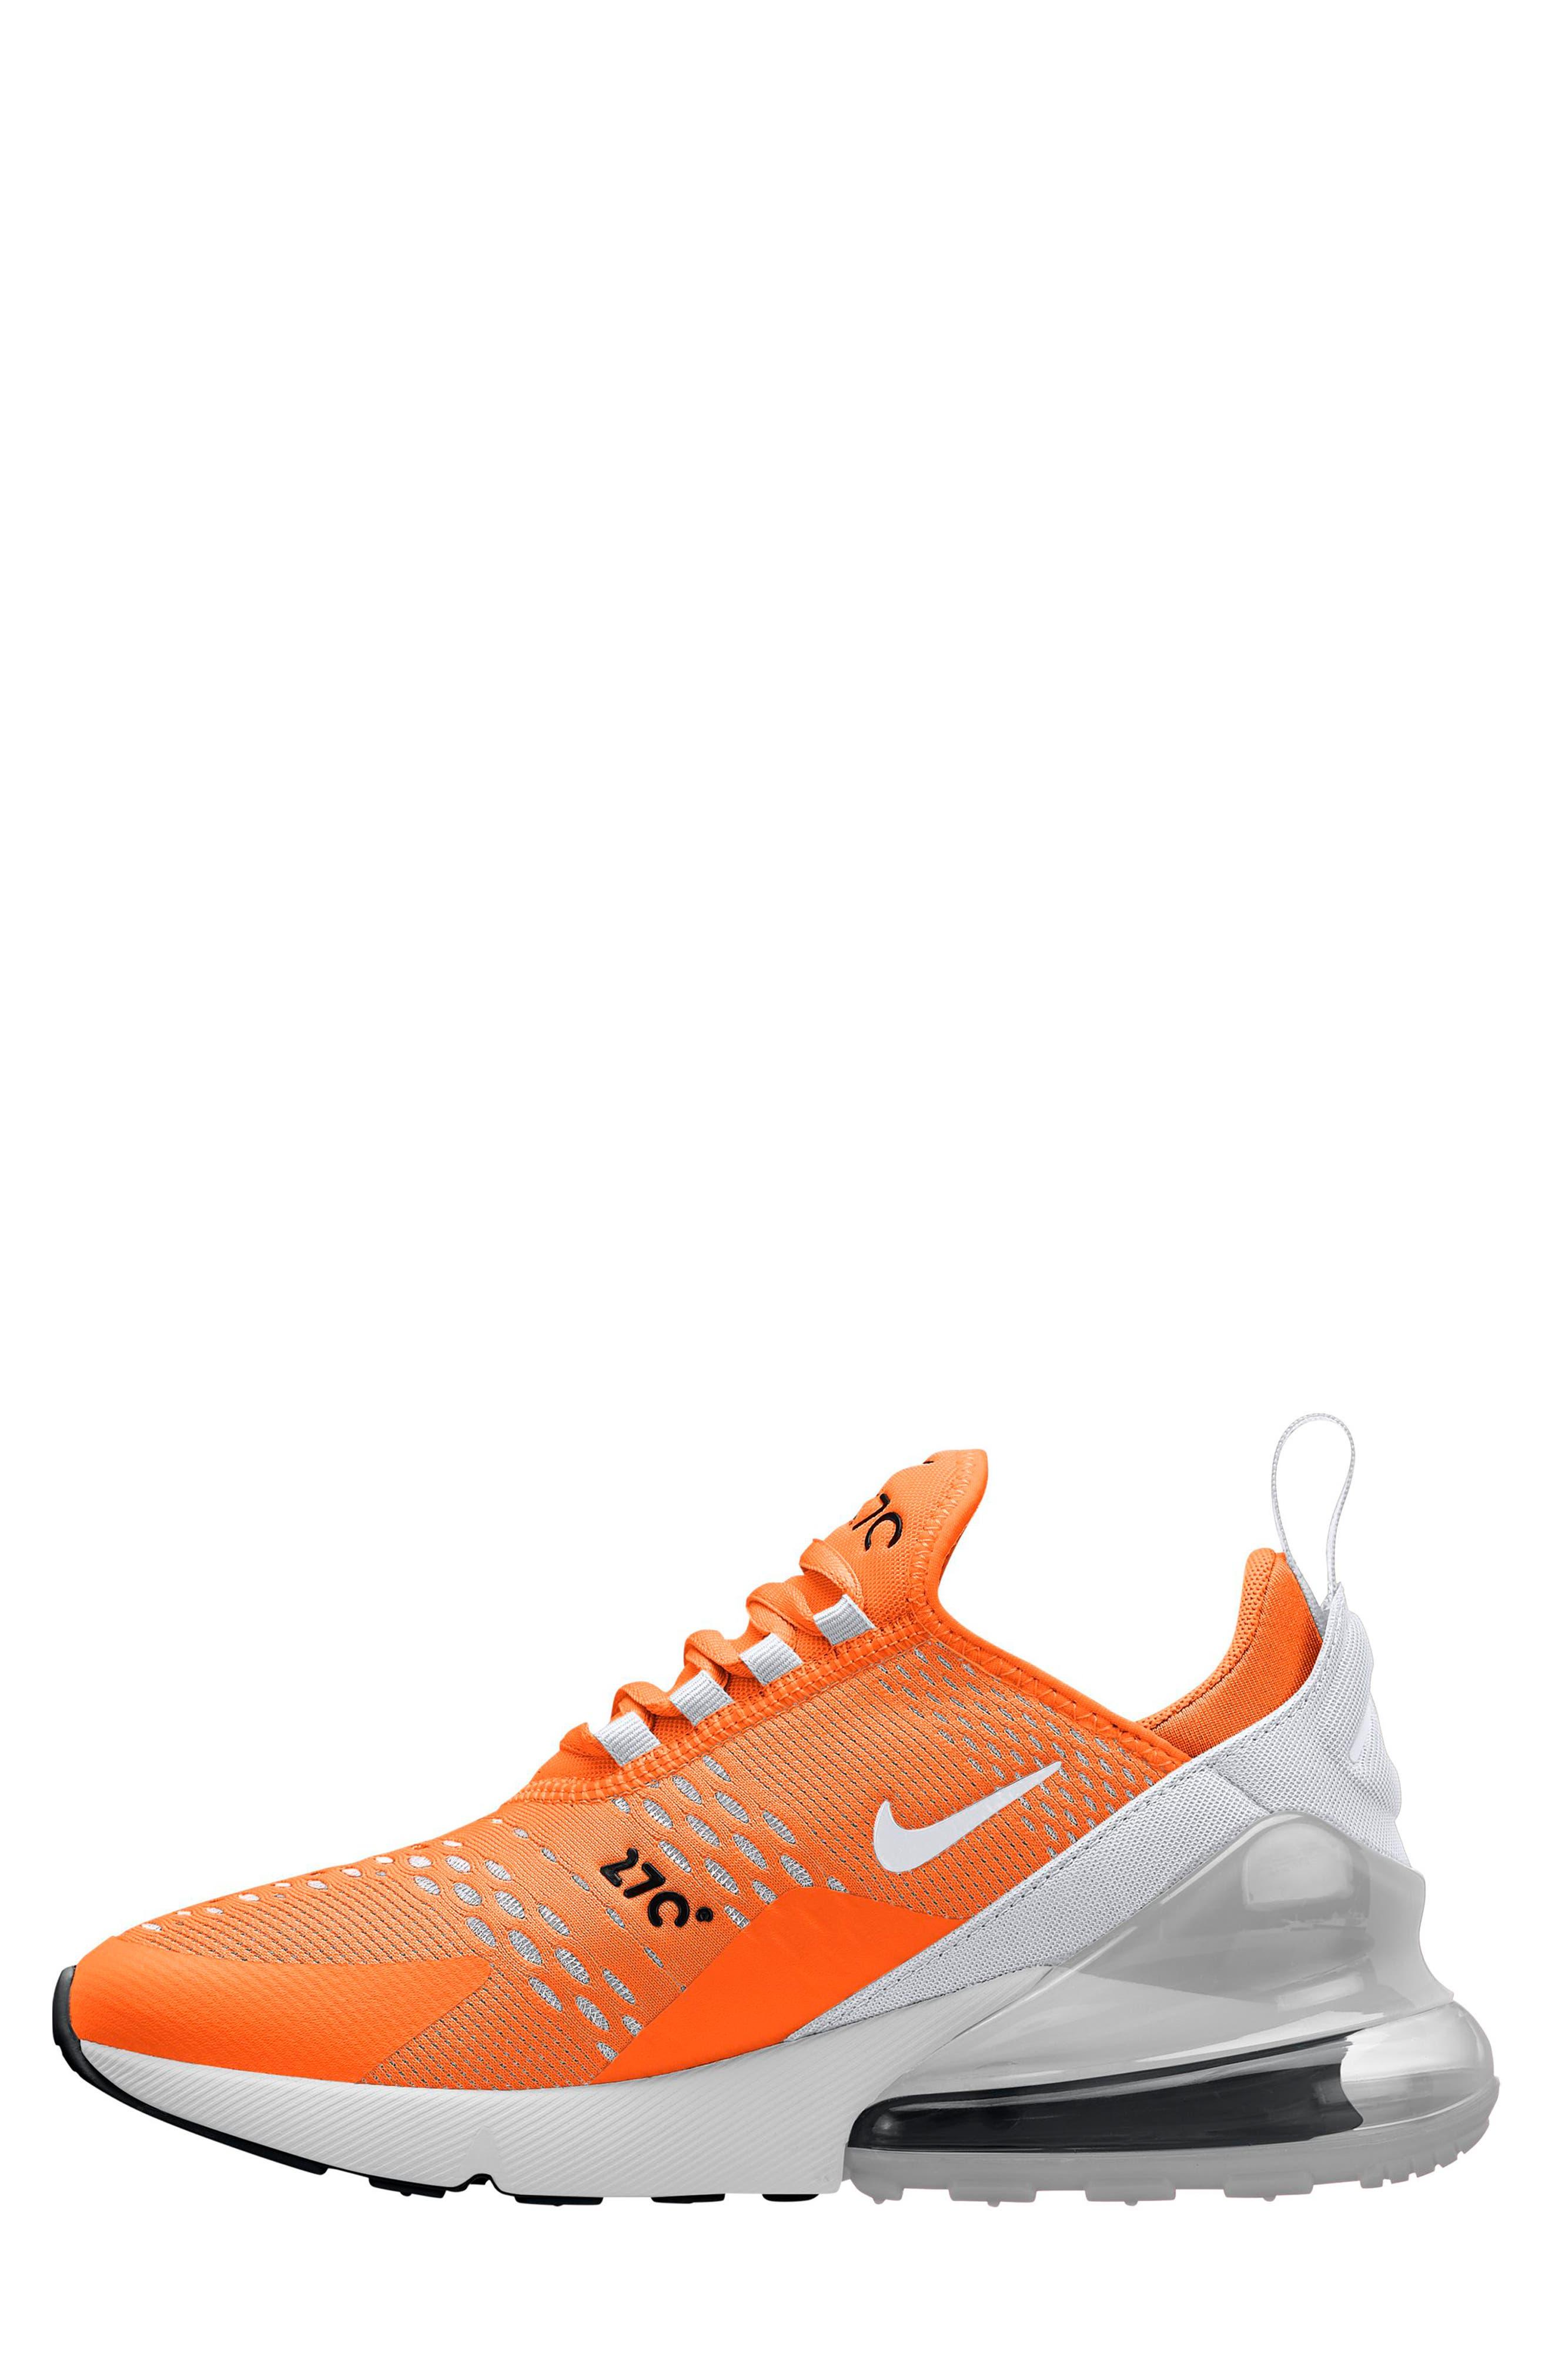 Air Max 270 Sneaker,                             Alternate thumbnail 2, color,                             Total Orange/ White-Black